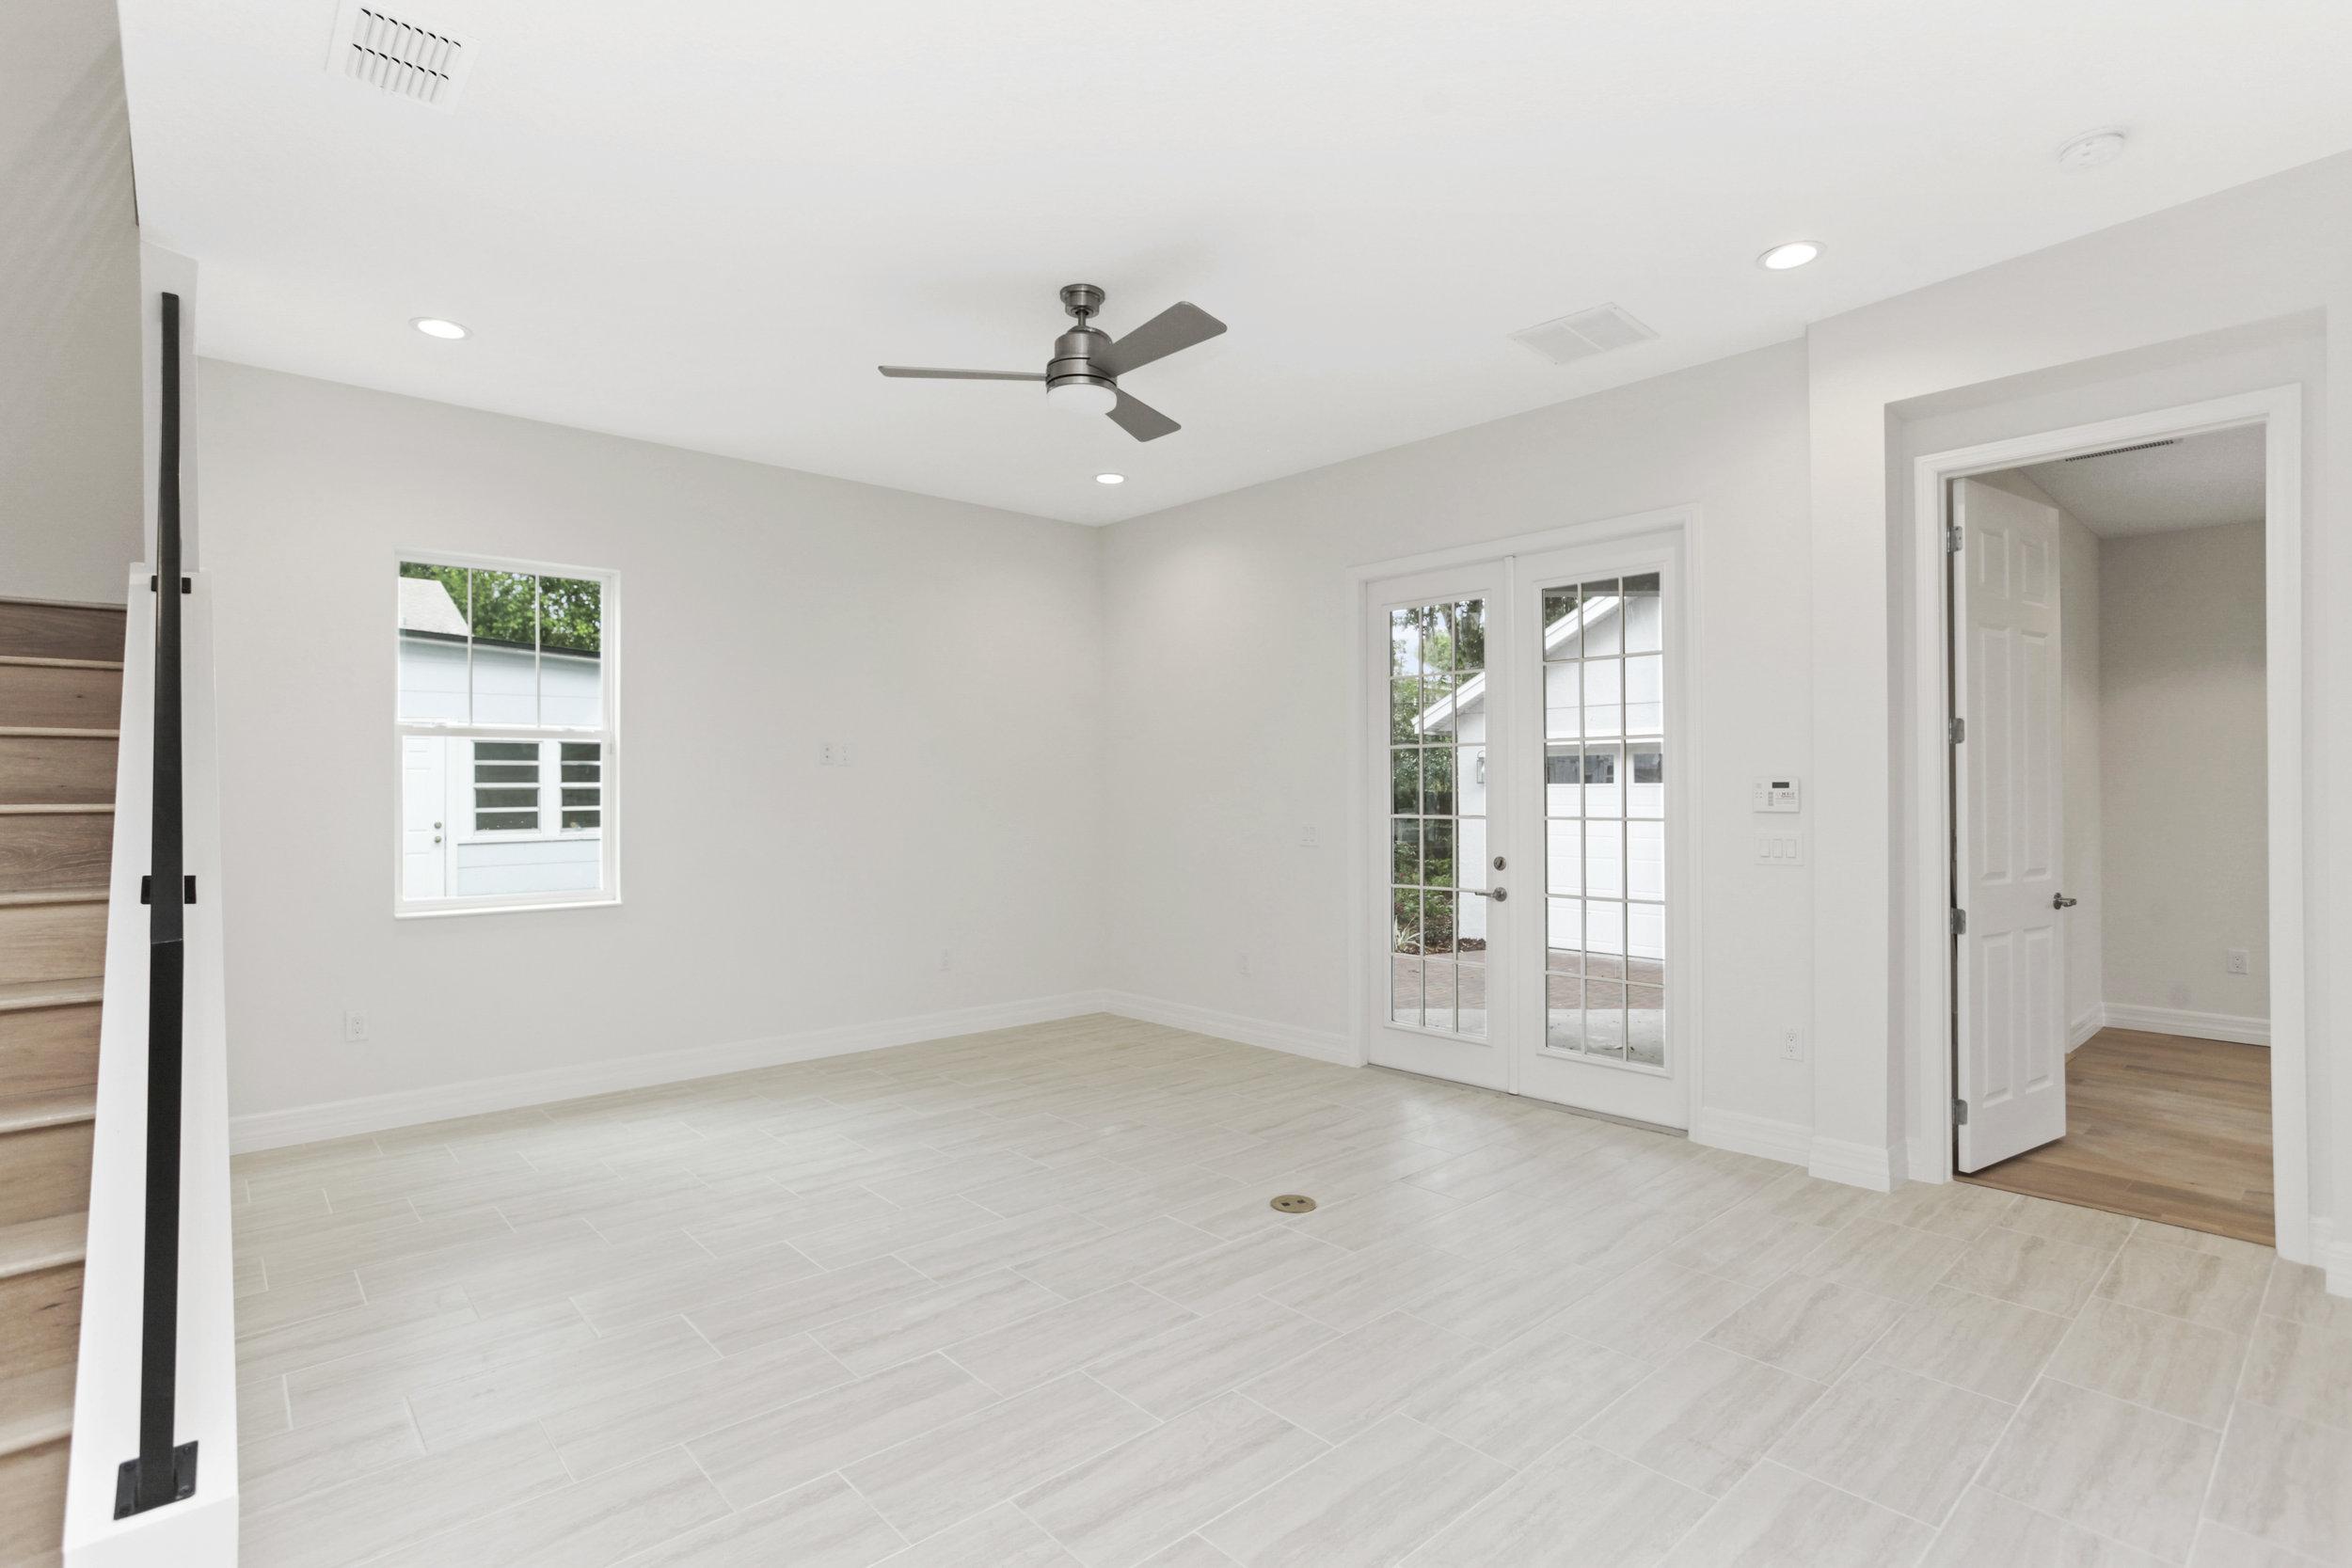 317 S Brown Ave, Orlando_IMG_0459.jpg